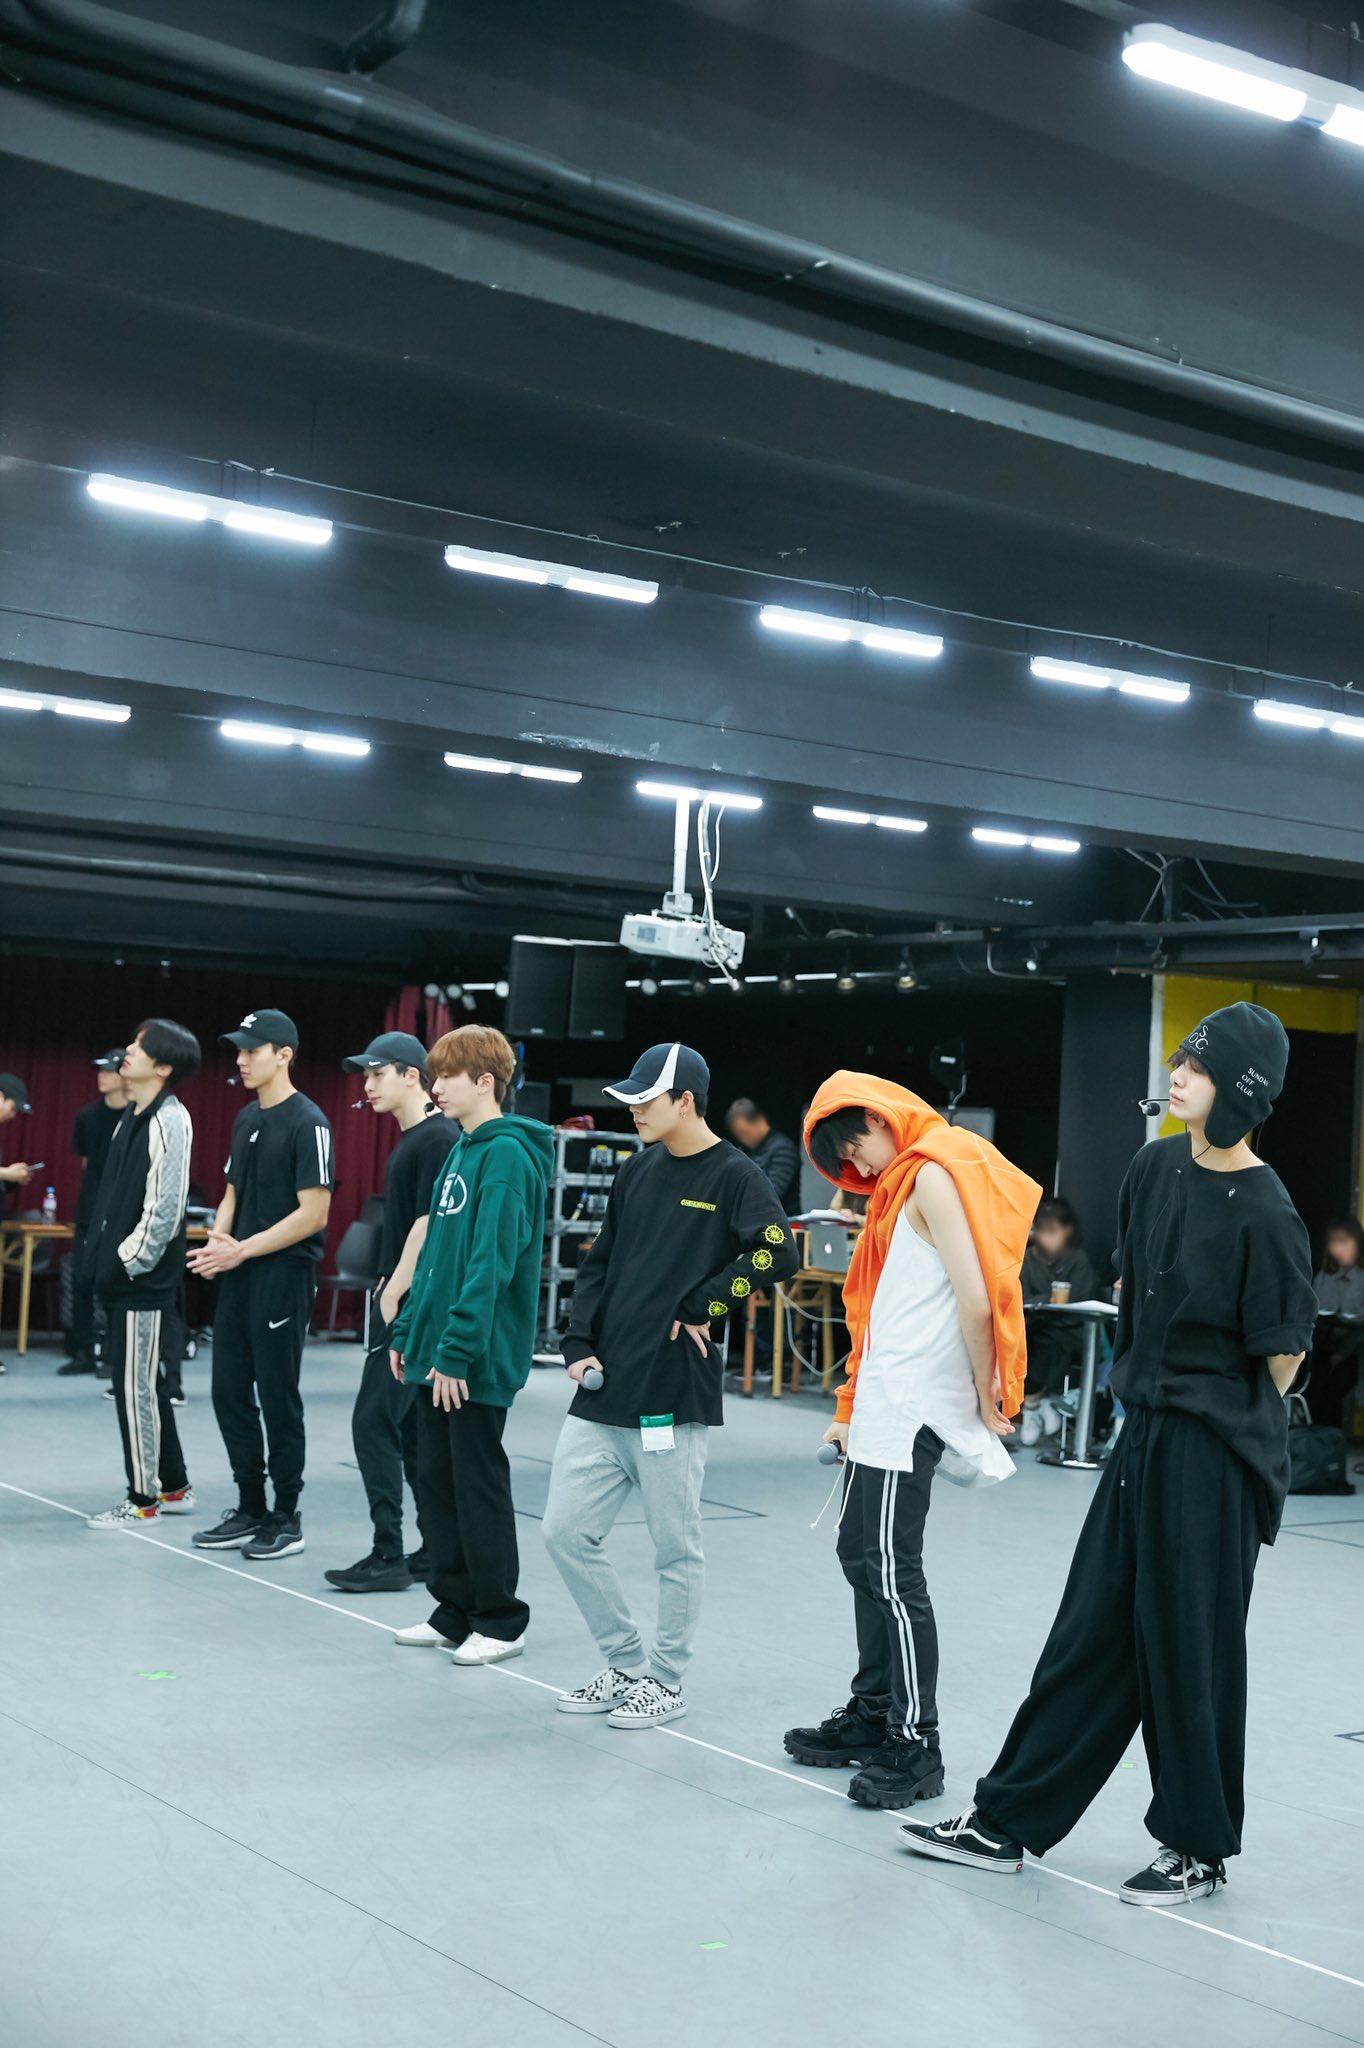 [#MONSTA_X]  2019 #MONSTAX WORLD TOUR  #WE_ARE_HERE IN #SEOUL ↓ラᄚ↓ハᄉ↓ヒᄂ →ᄍト■ユリ↓ンᄌ→モワ ↑ᄈᄉ↑ᄚワ   #→ᆰᆲ↓ハᄂ■テタ↓ラム↓ハᄂ  #↓トワ↓レᄌ #→ᆰᆲ↓ハᄂ■テタ↓ラム↓ハᄂ↓ロヤ→モワ■ネᆲ↓ヨᄡ https://t.co/mwIidgamKM